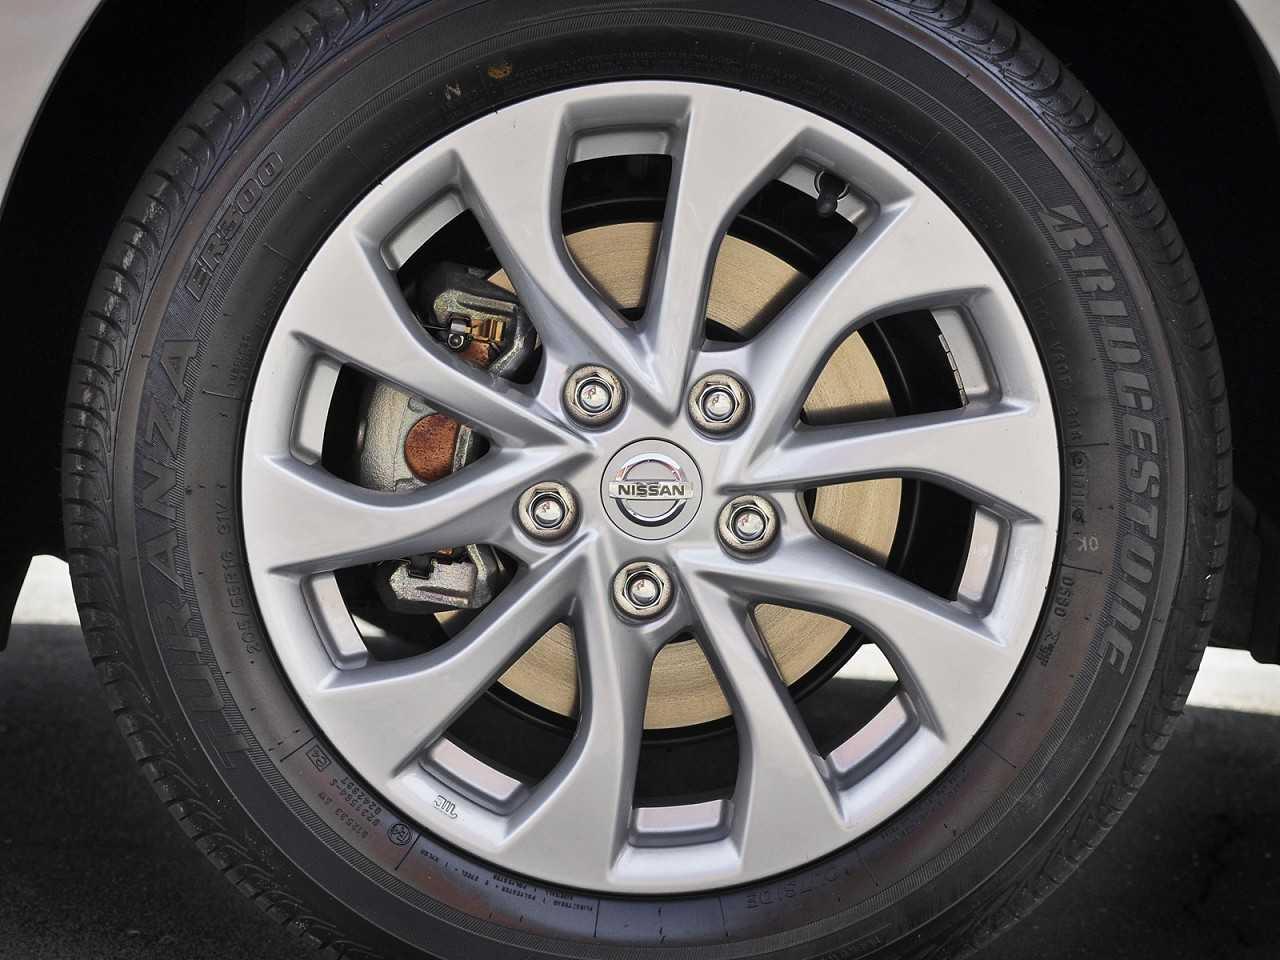 NissanSentra 2017 - rodas